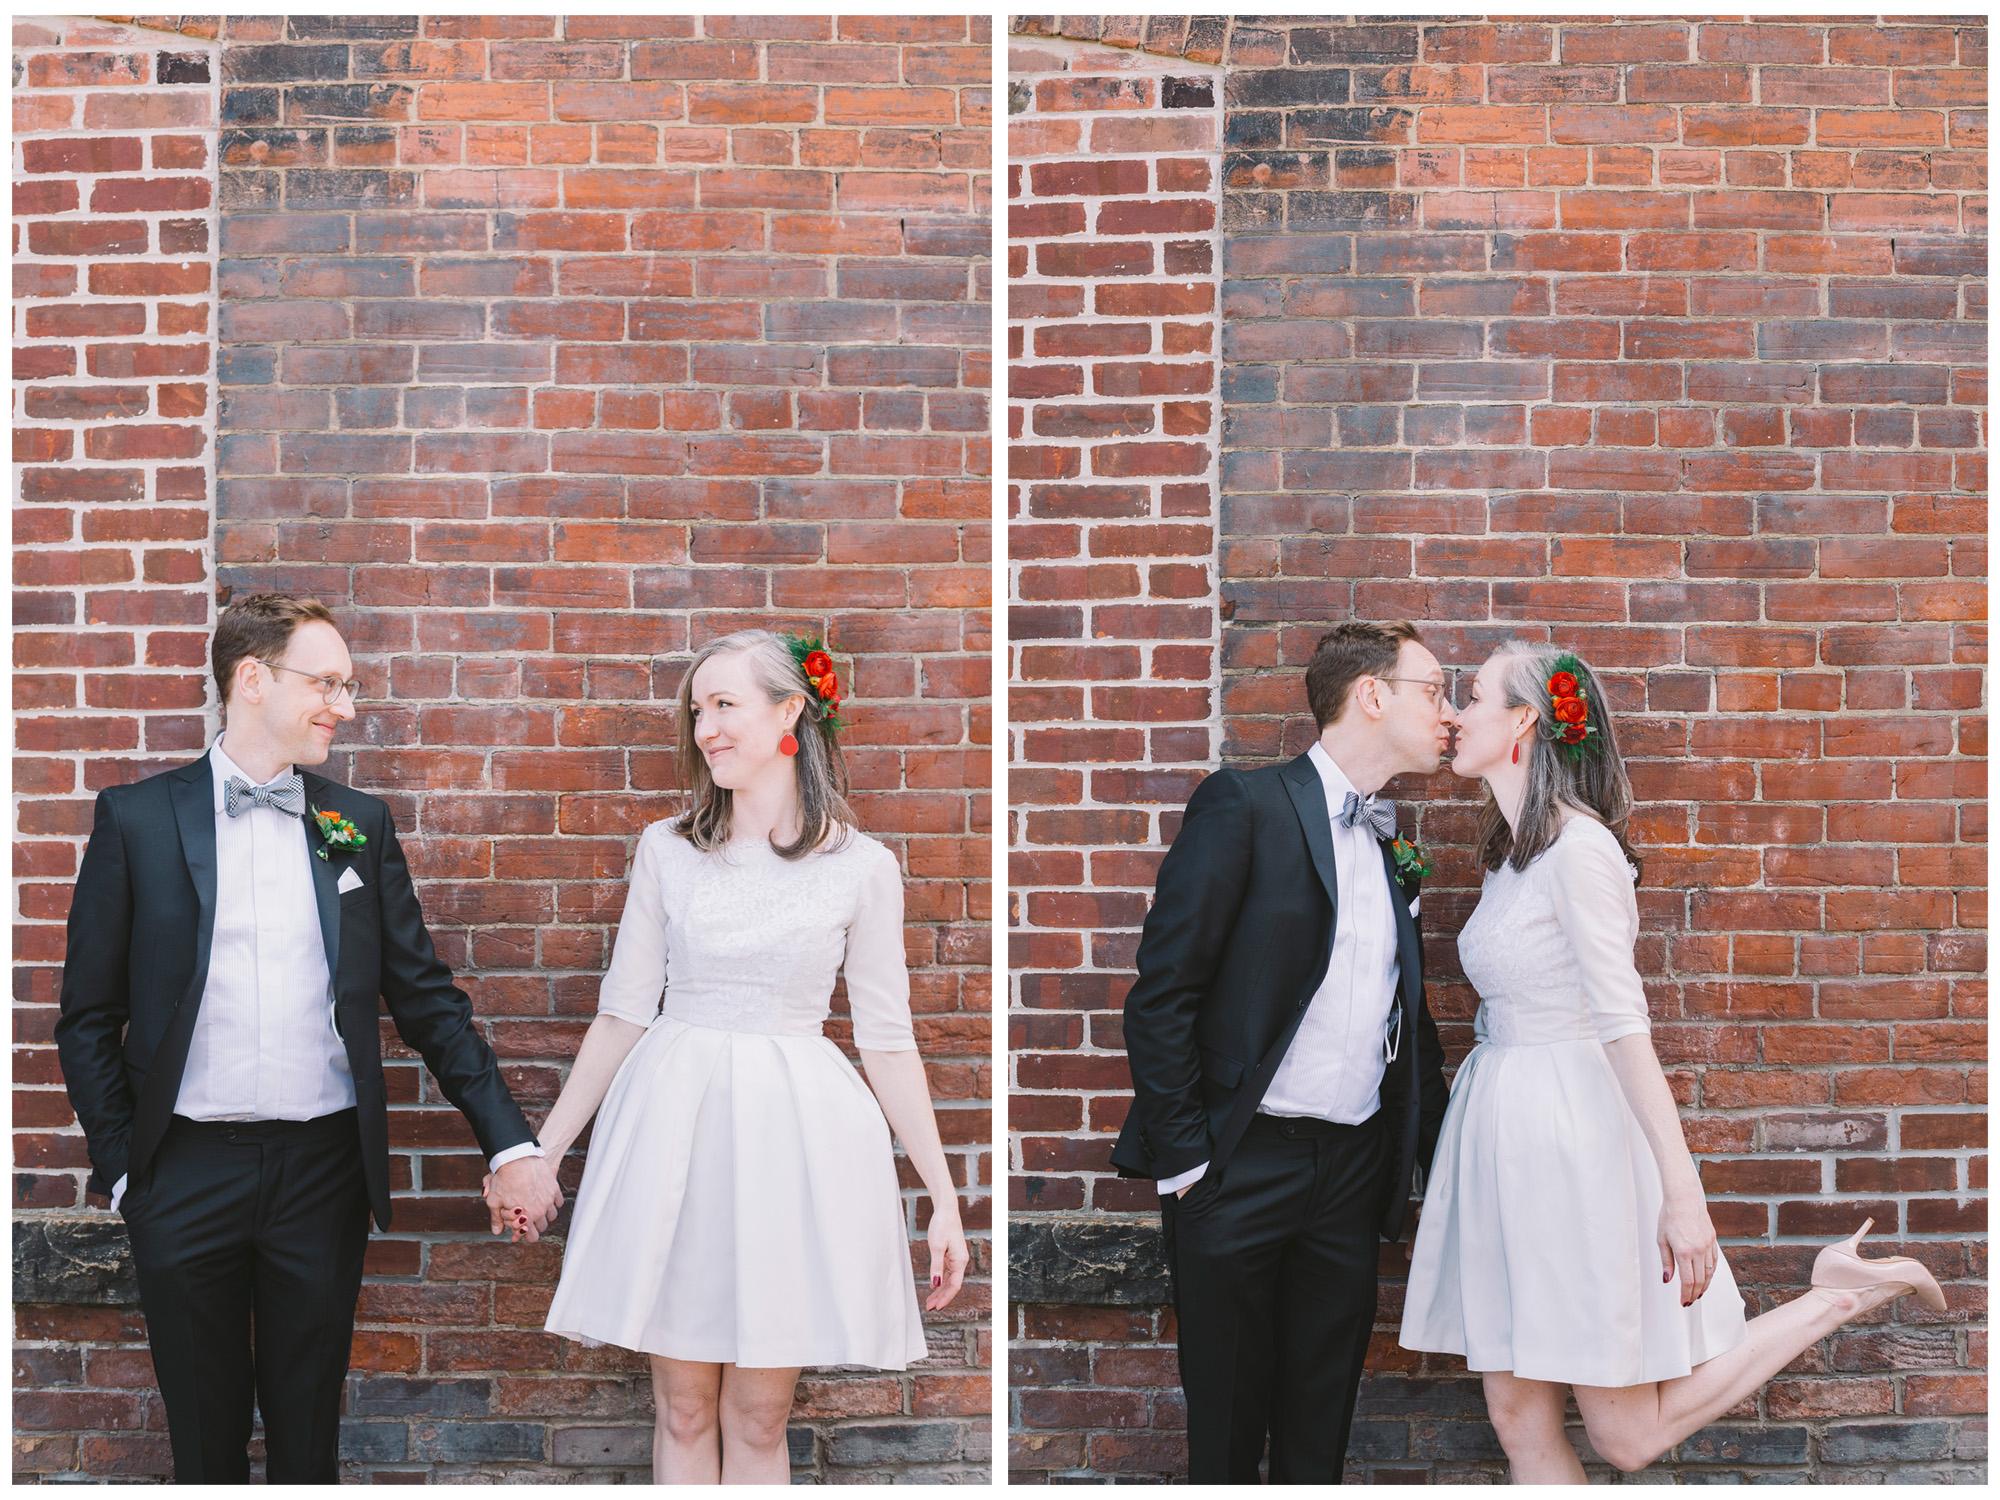 Gladstone Hotel Wedding Photo with Brick Wall